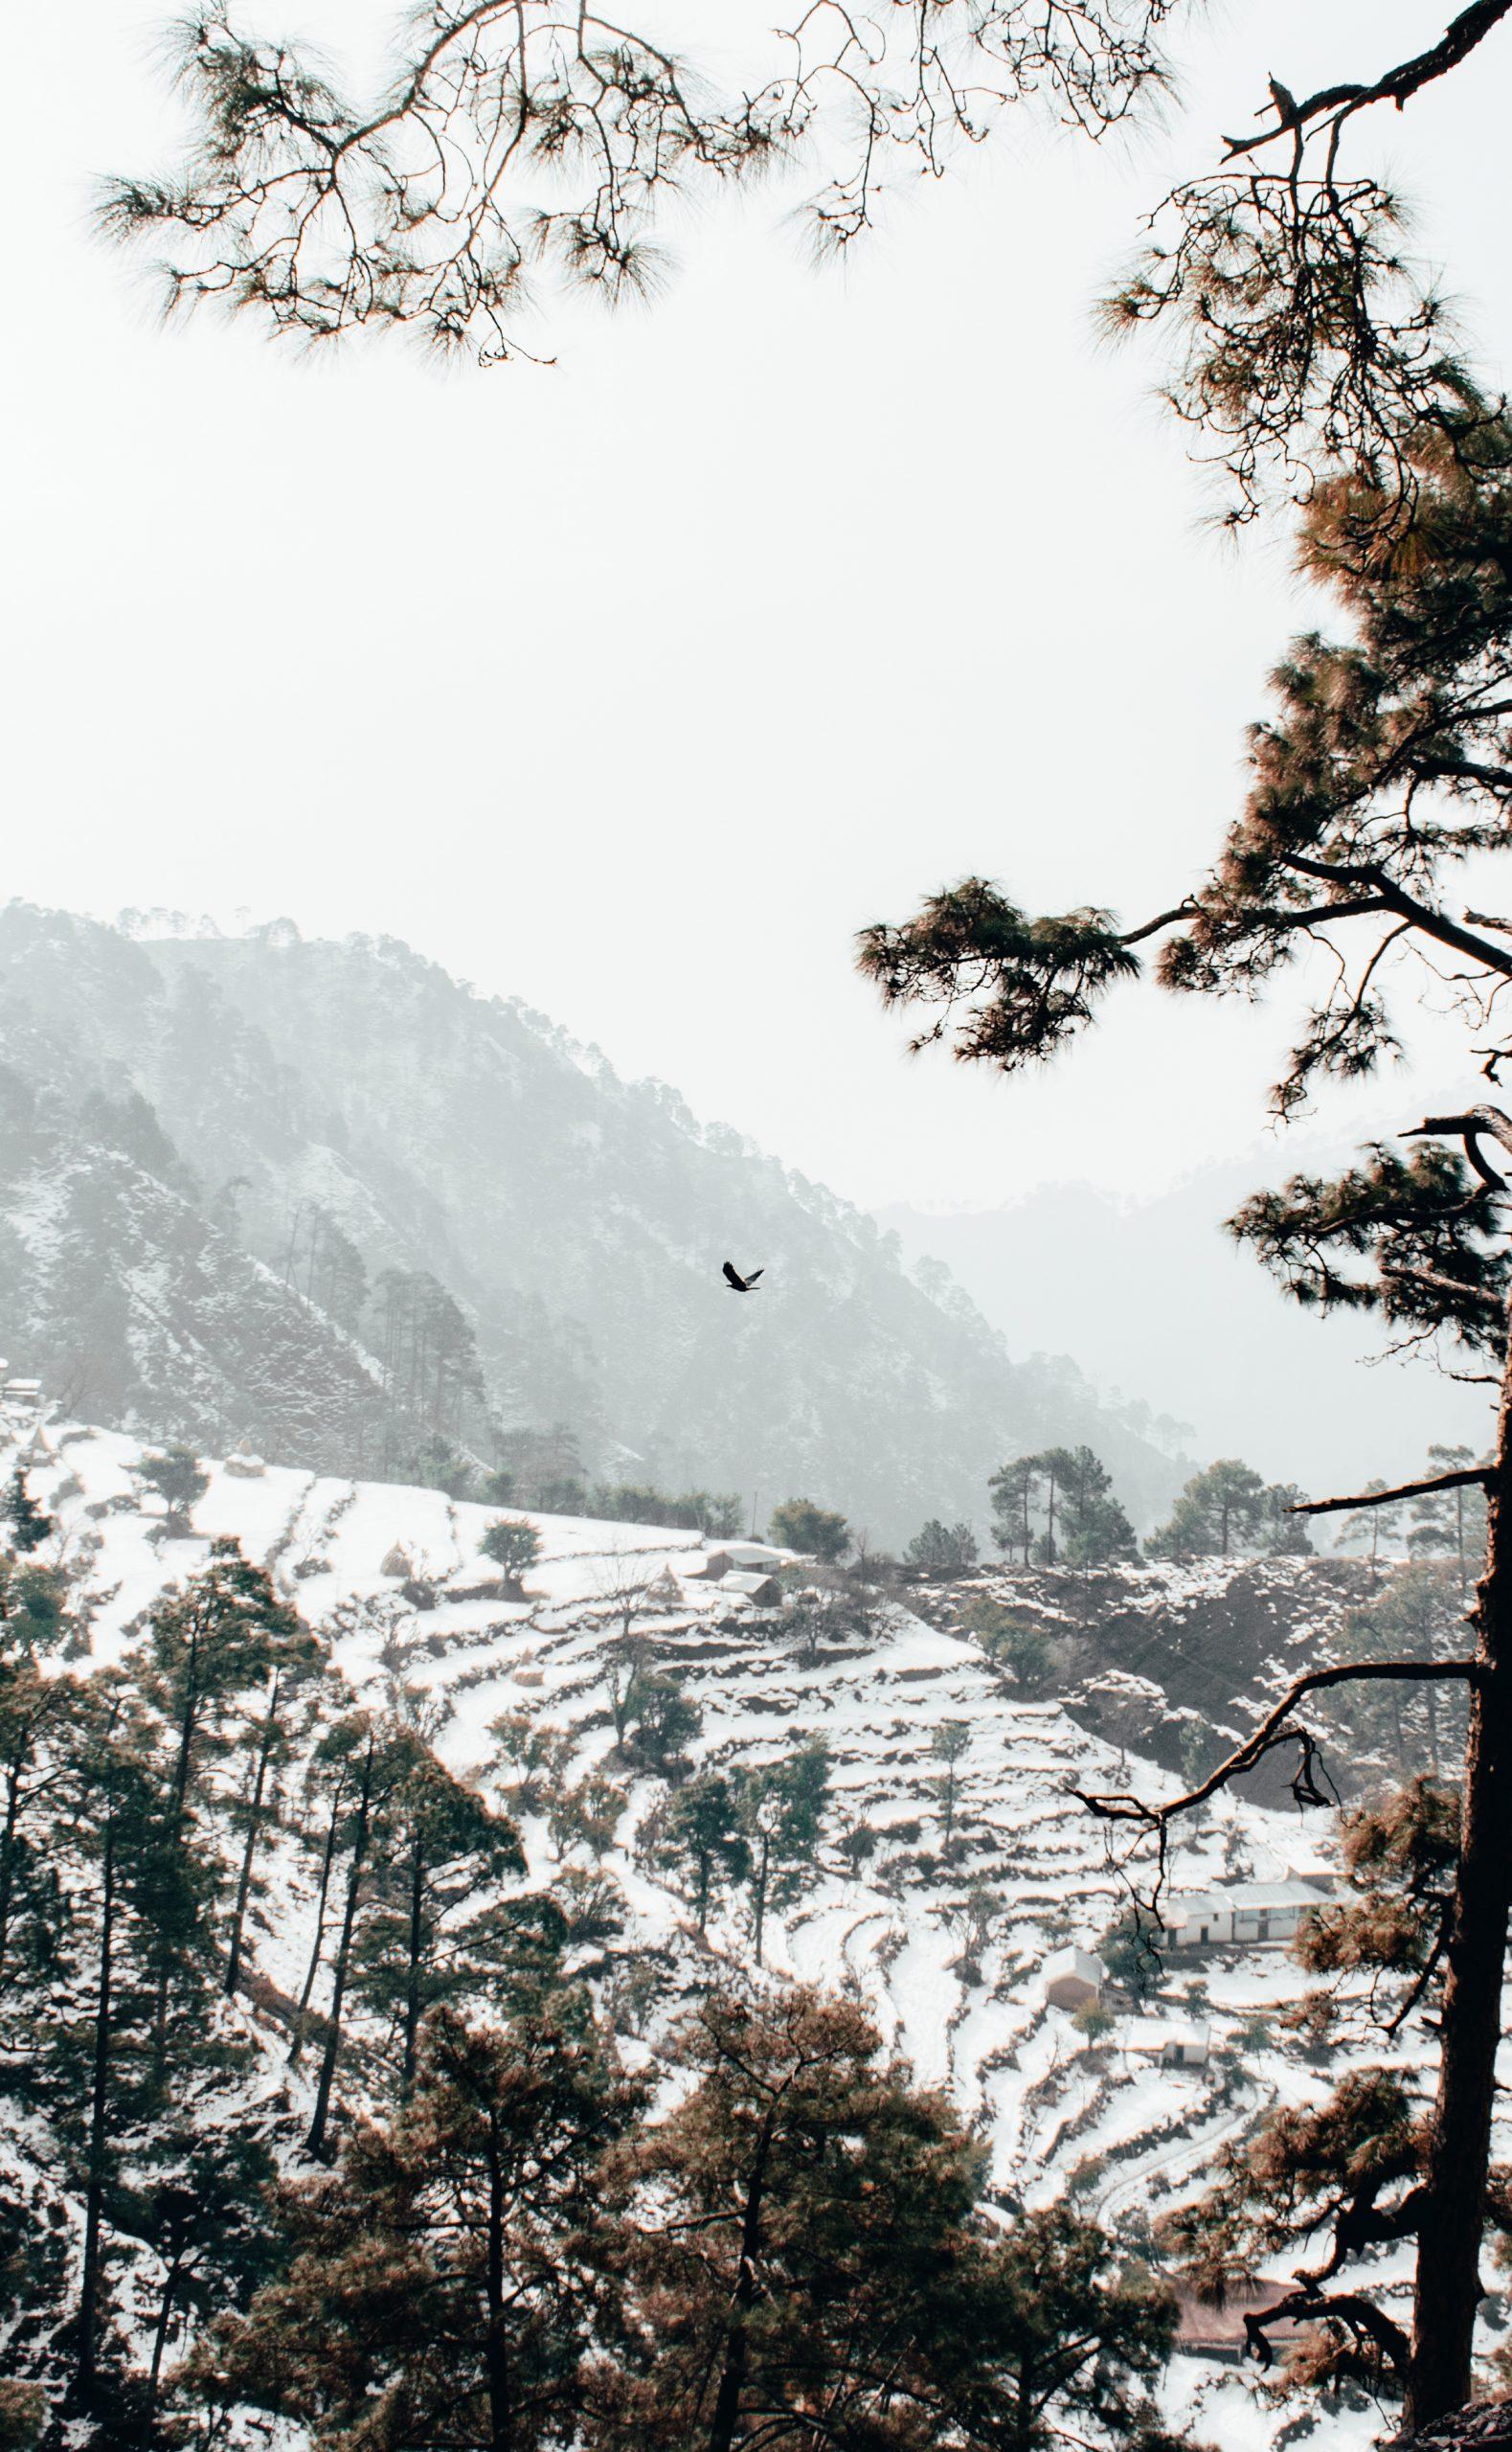 Snow fall on mountains